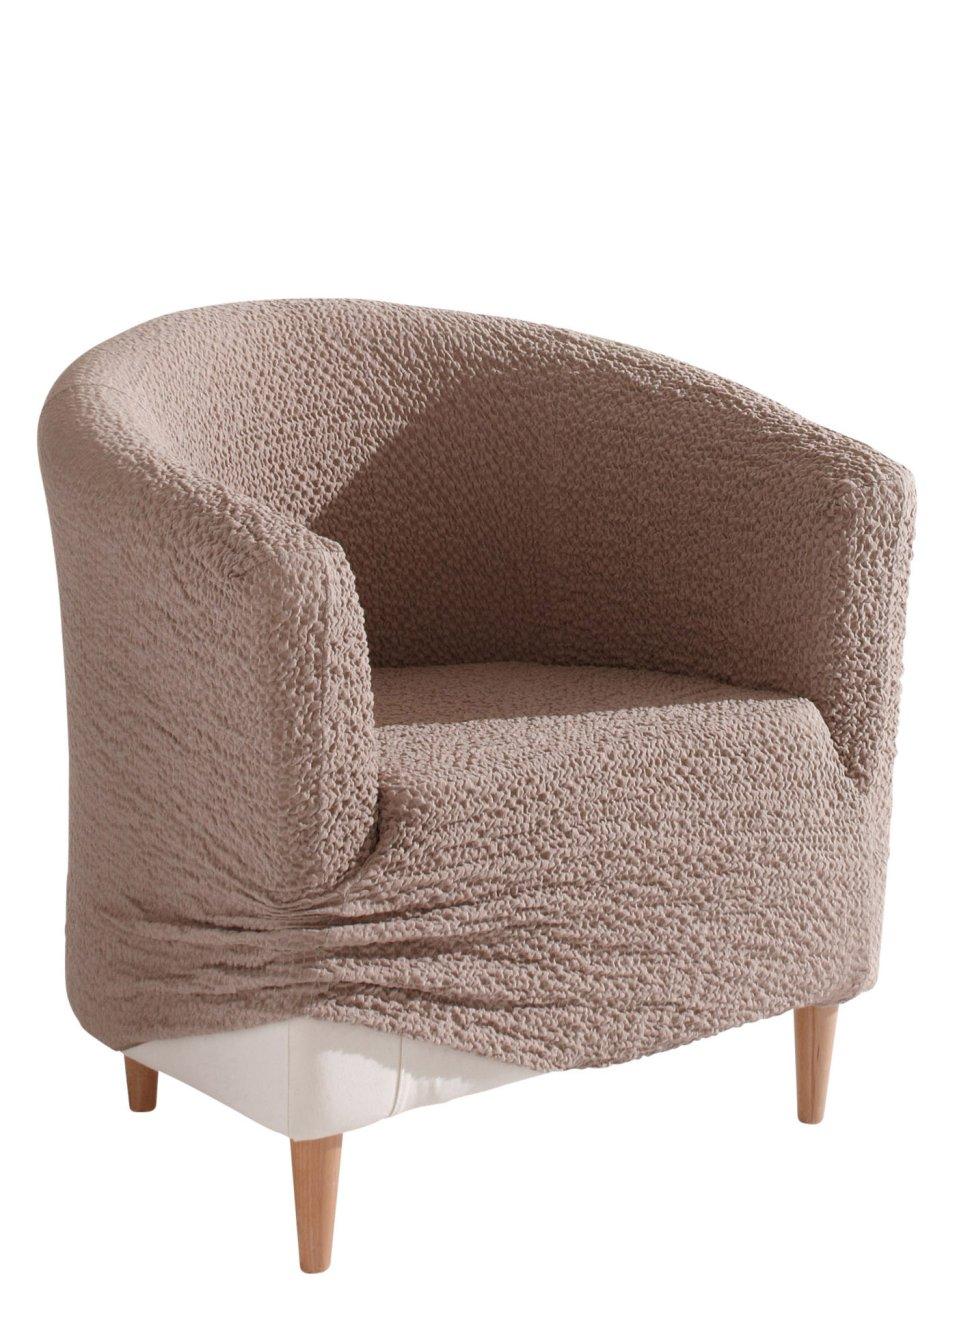 sch ner neuer look sesselhusse crincle caramel. Black Bedroom Furniture Sets. Home Design Ideas